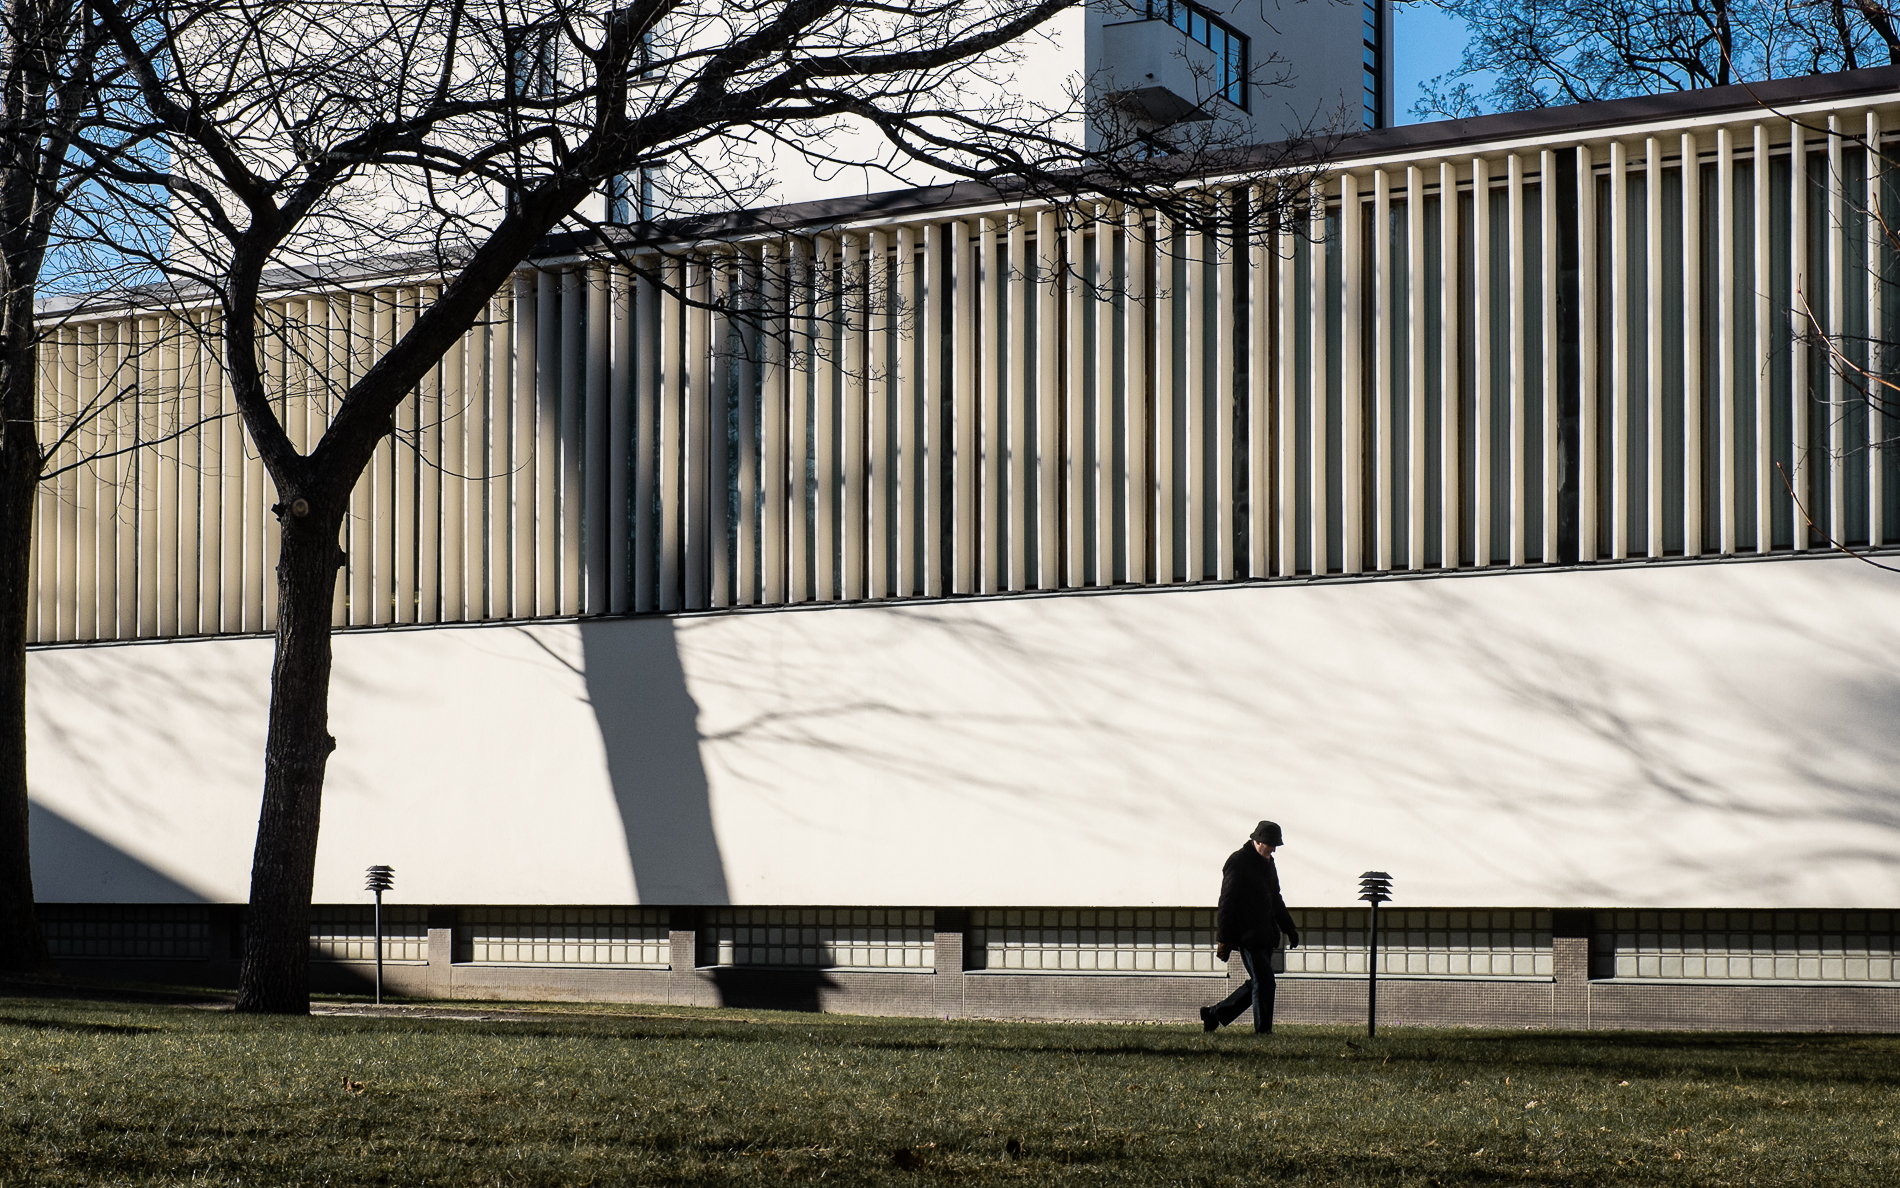 SPRING SHADOWS - TURKU FINLAND - MARCH 2015